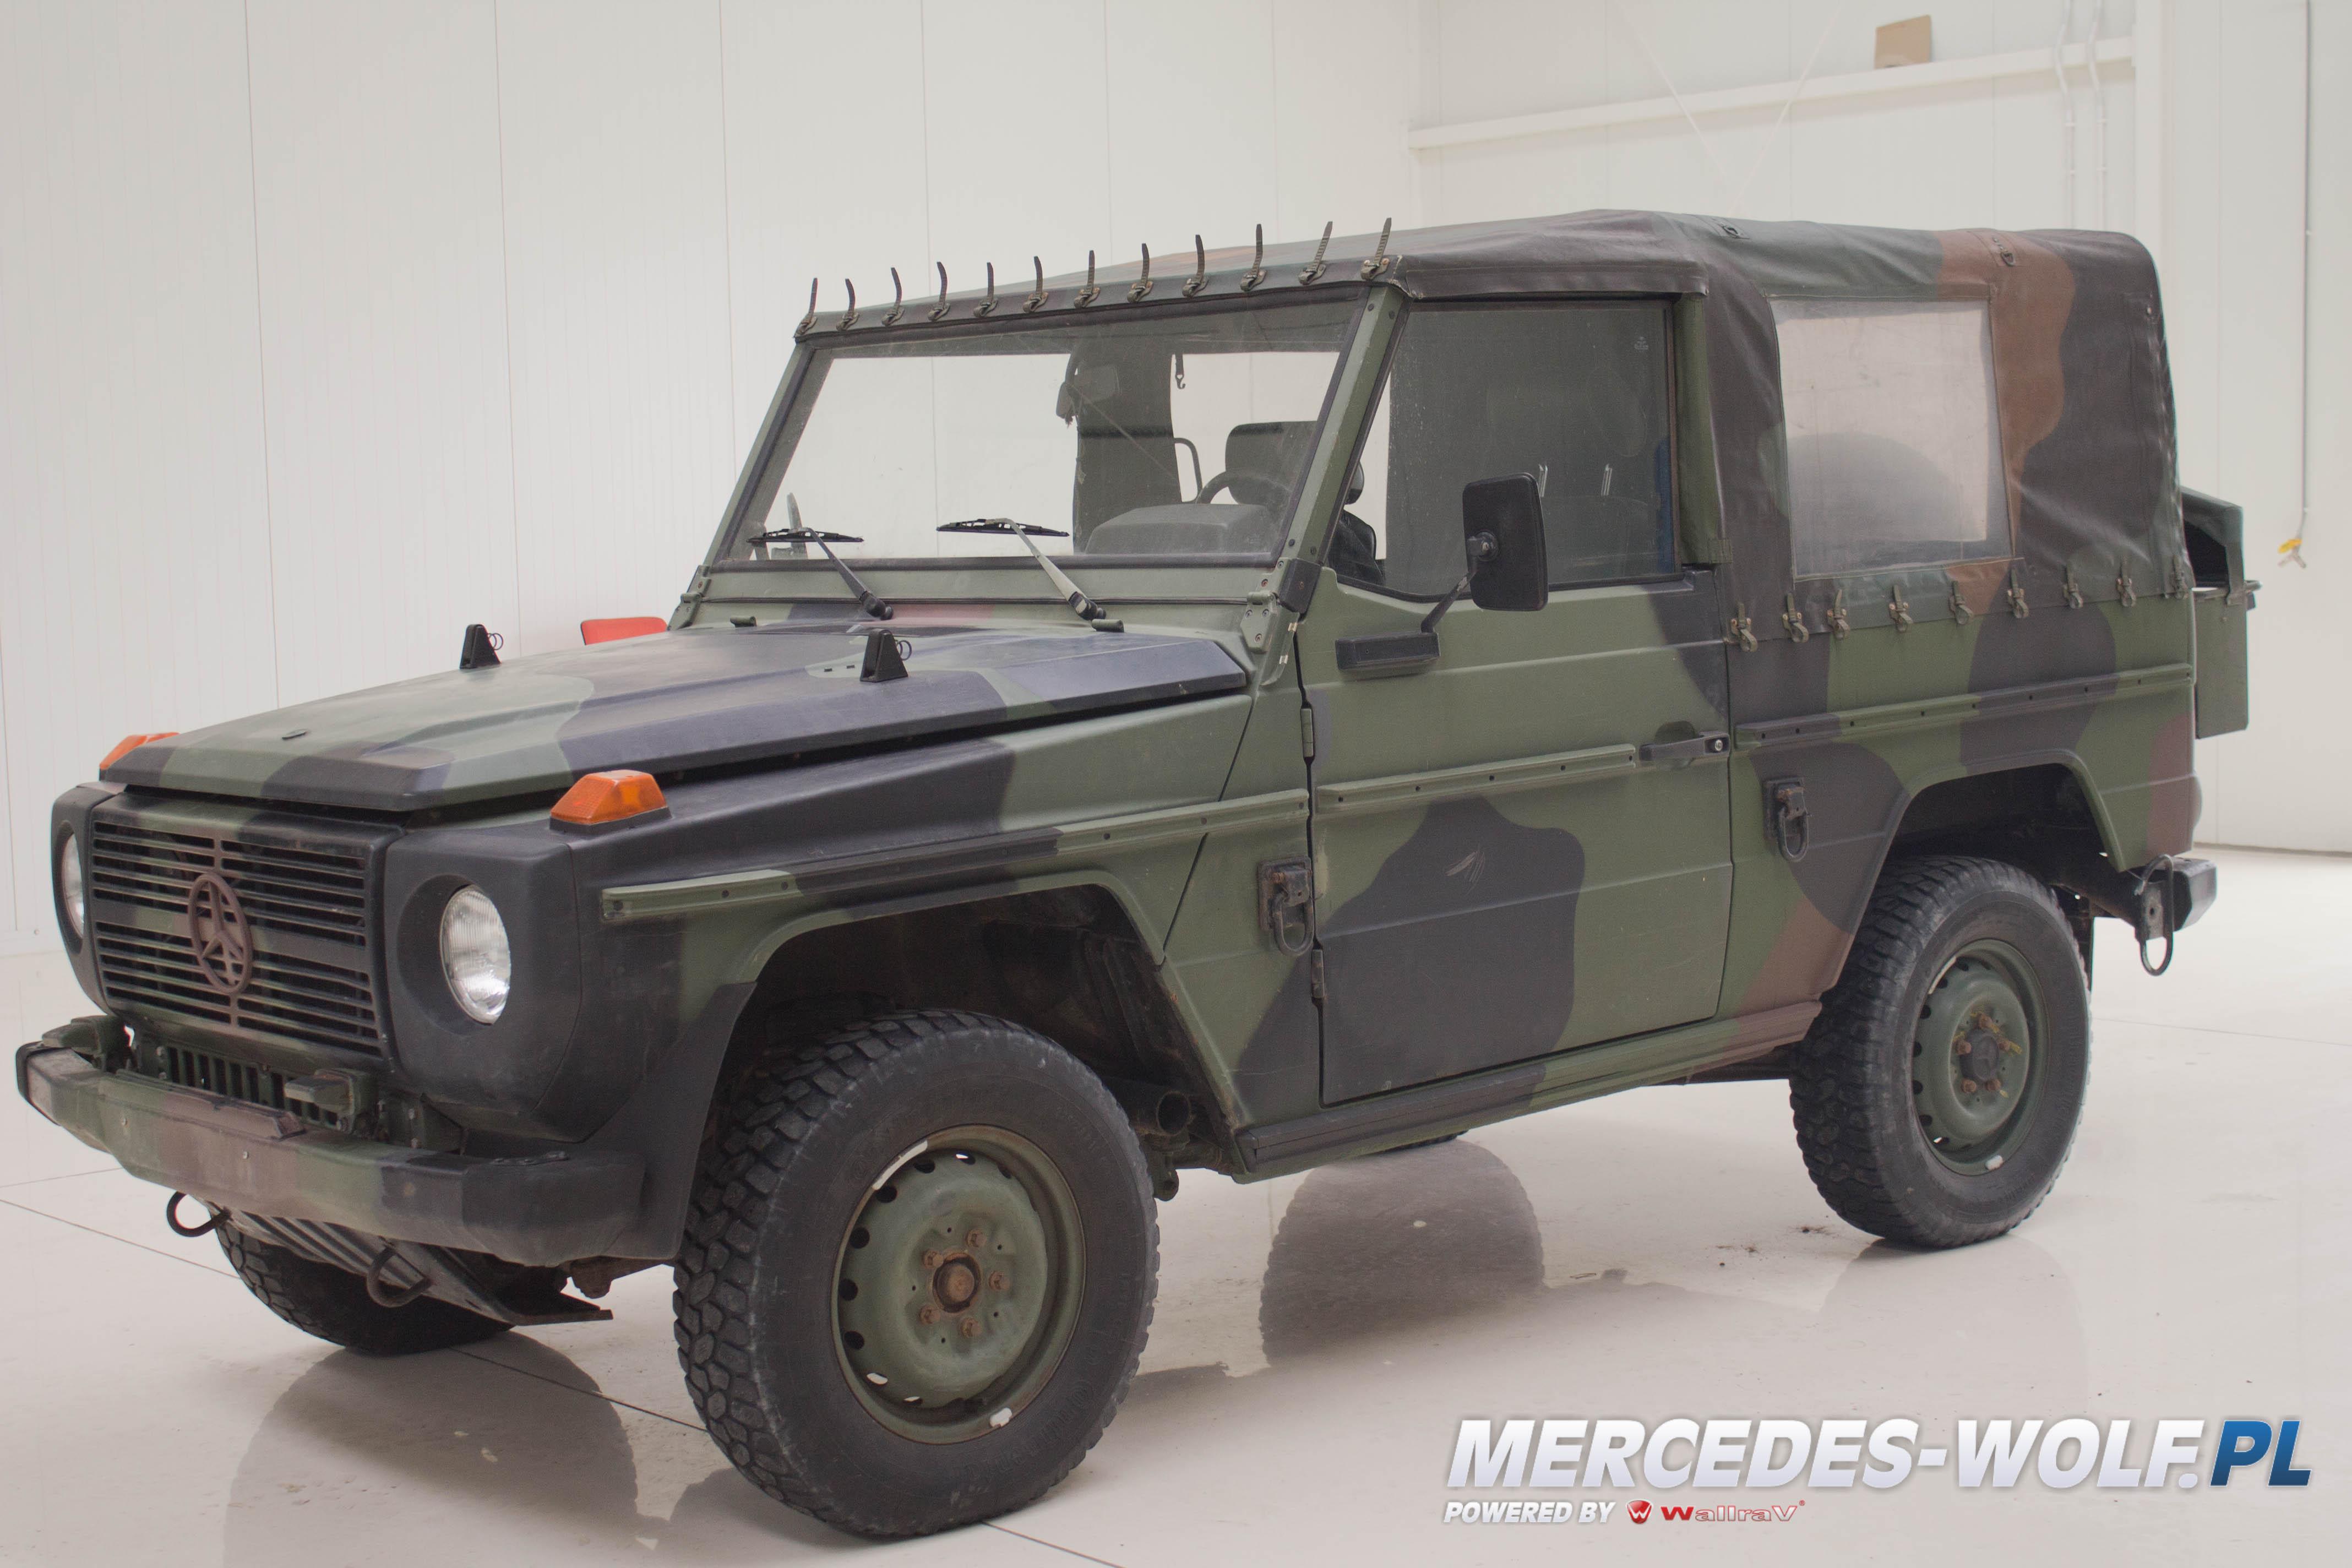 mercedes benz 250gd wolf 75ll mercedes mercedes g class g force 1 en mercedes. Black Bedroom Furniture Sets. Home Design Ideas